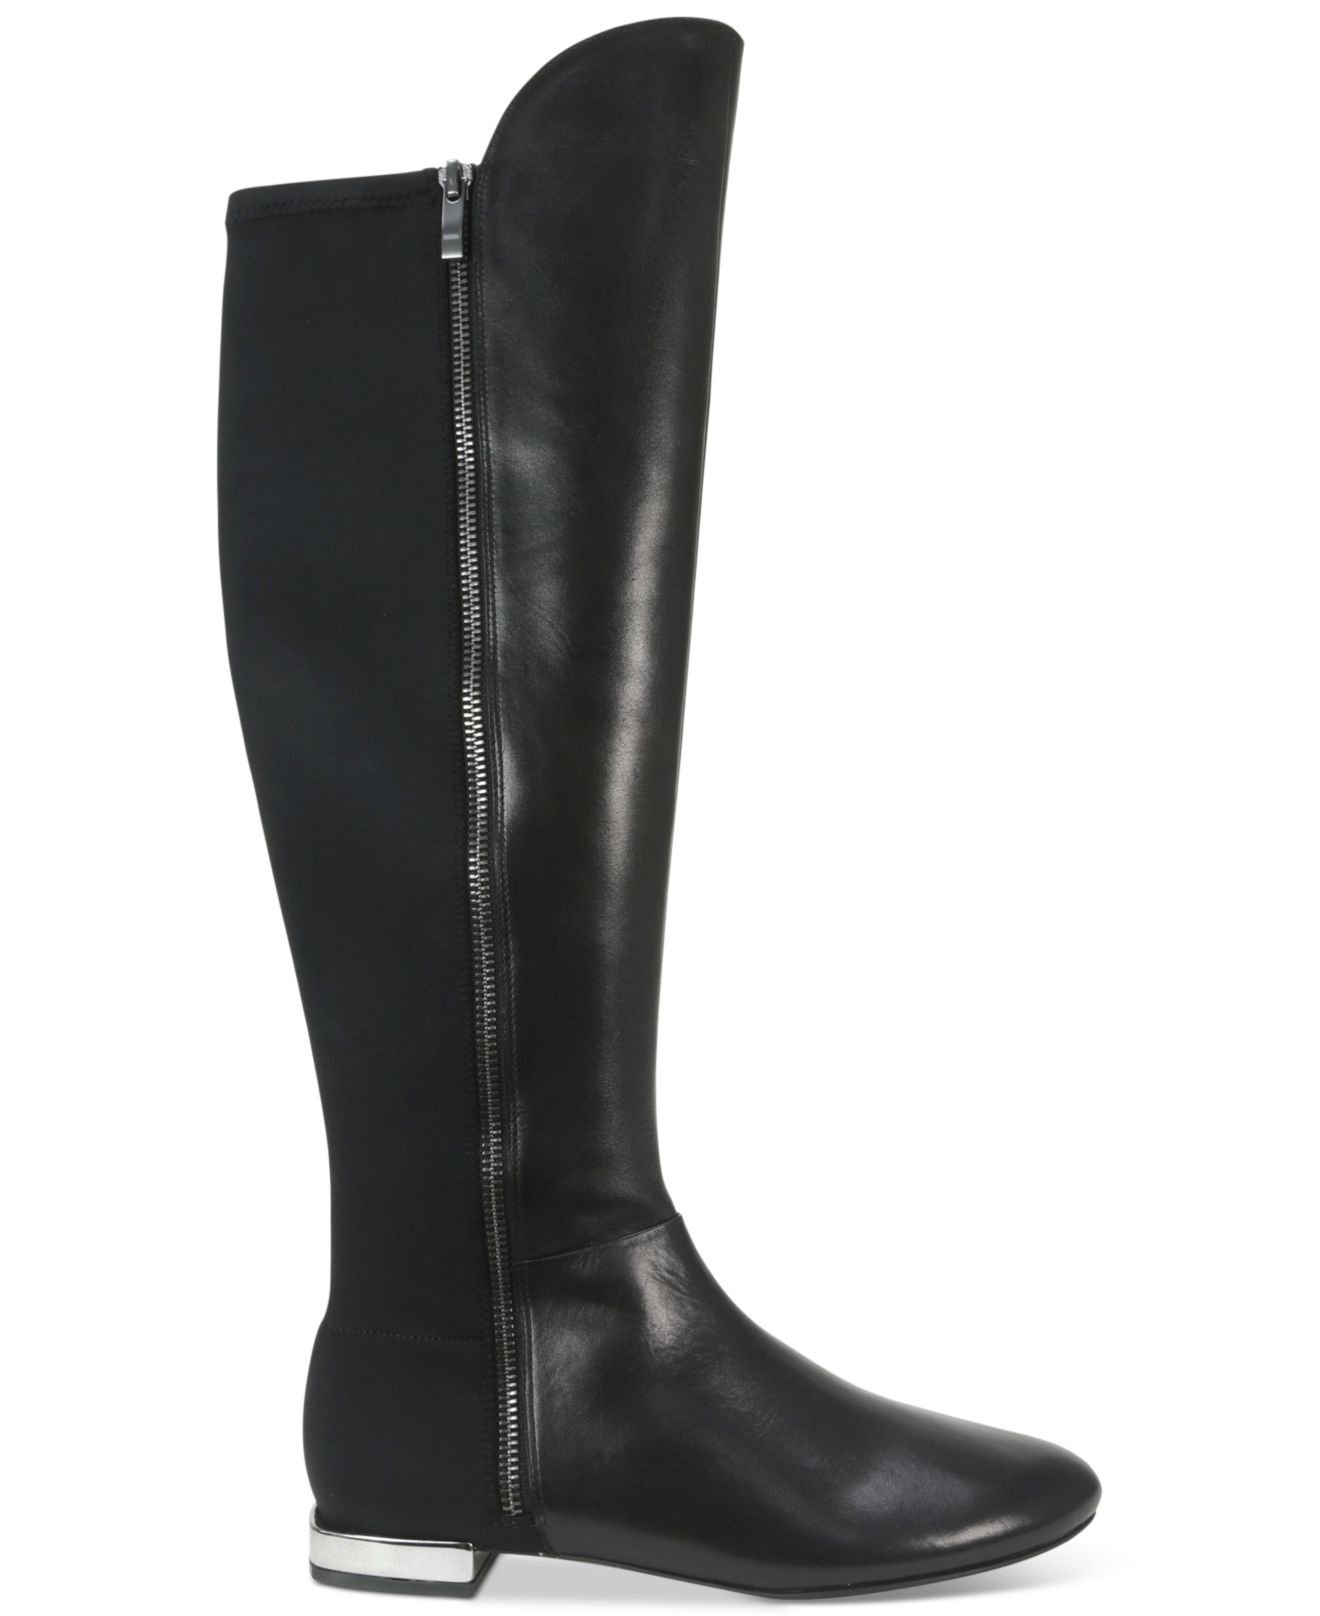 tahari ramses the knee boots in black lyst